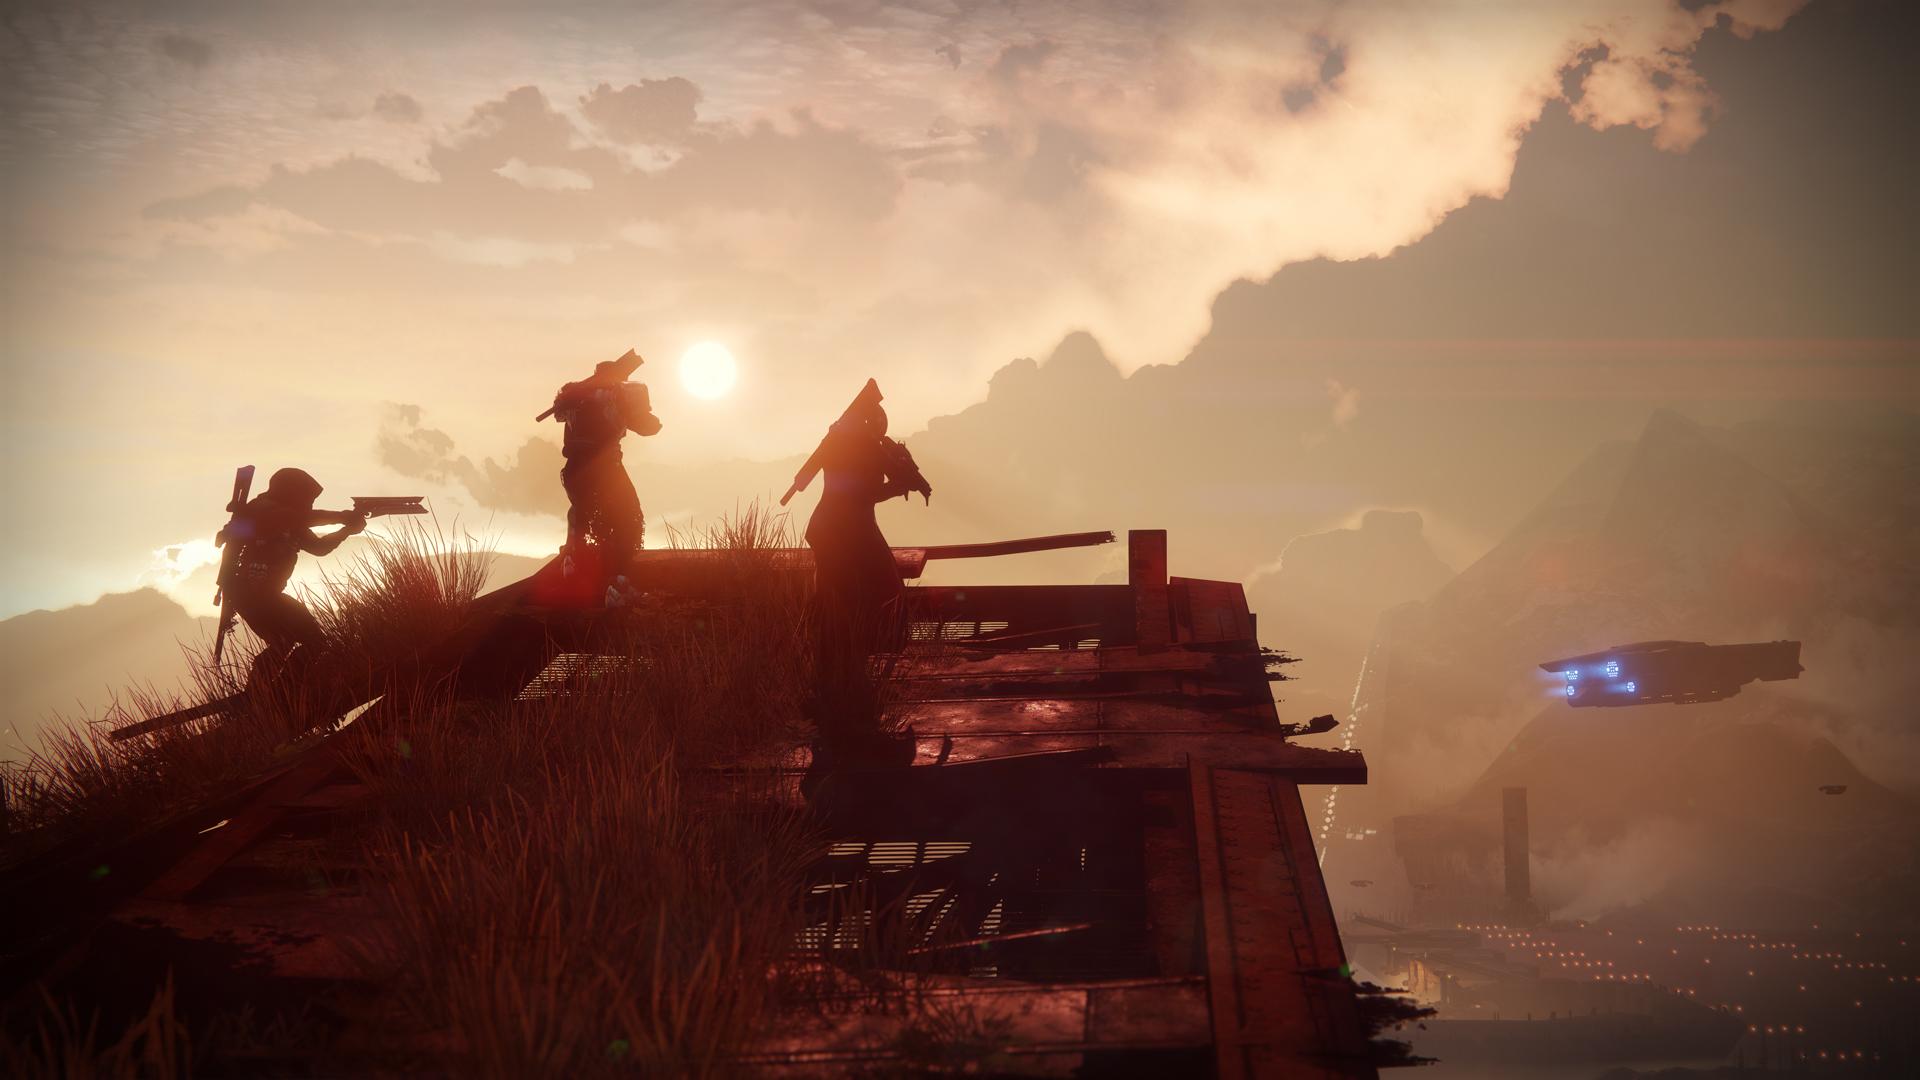 Destiny 2 - as the sun sets, three Guardians go on an Adventure